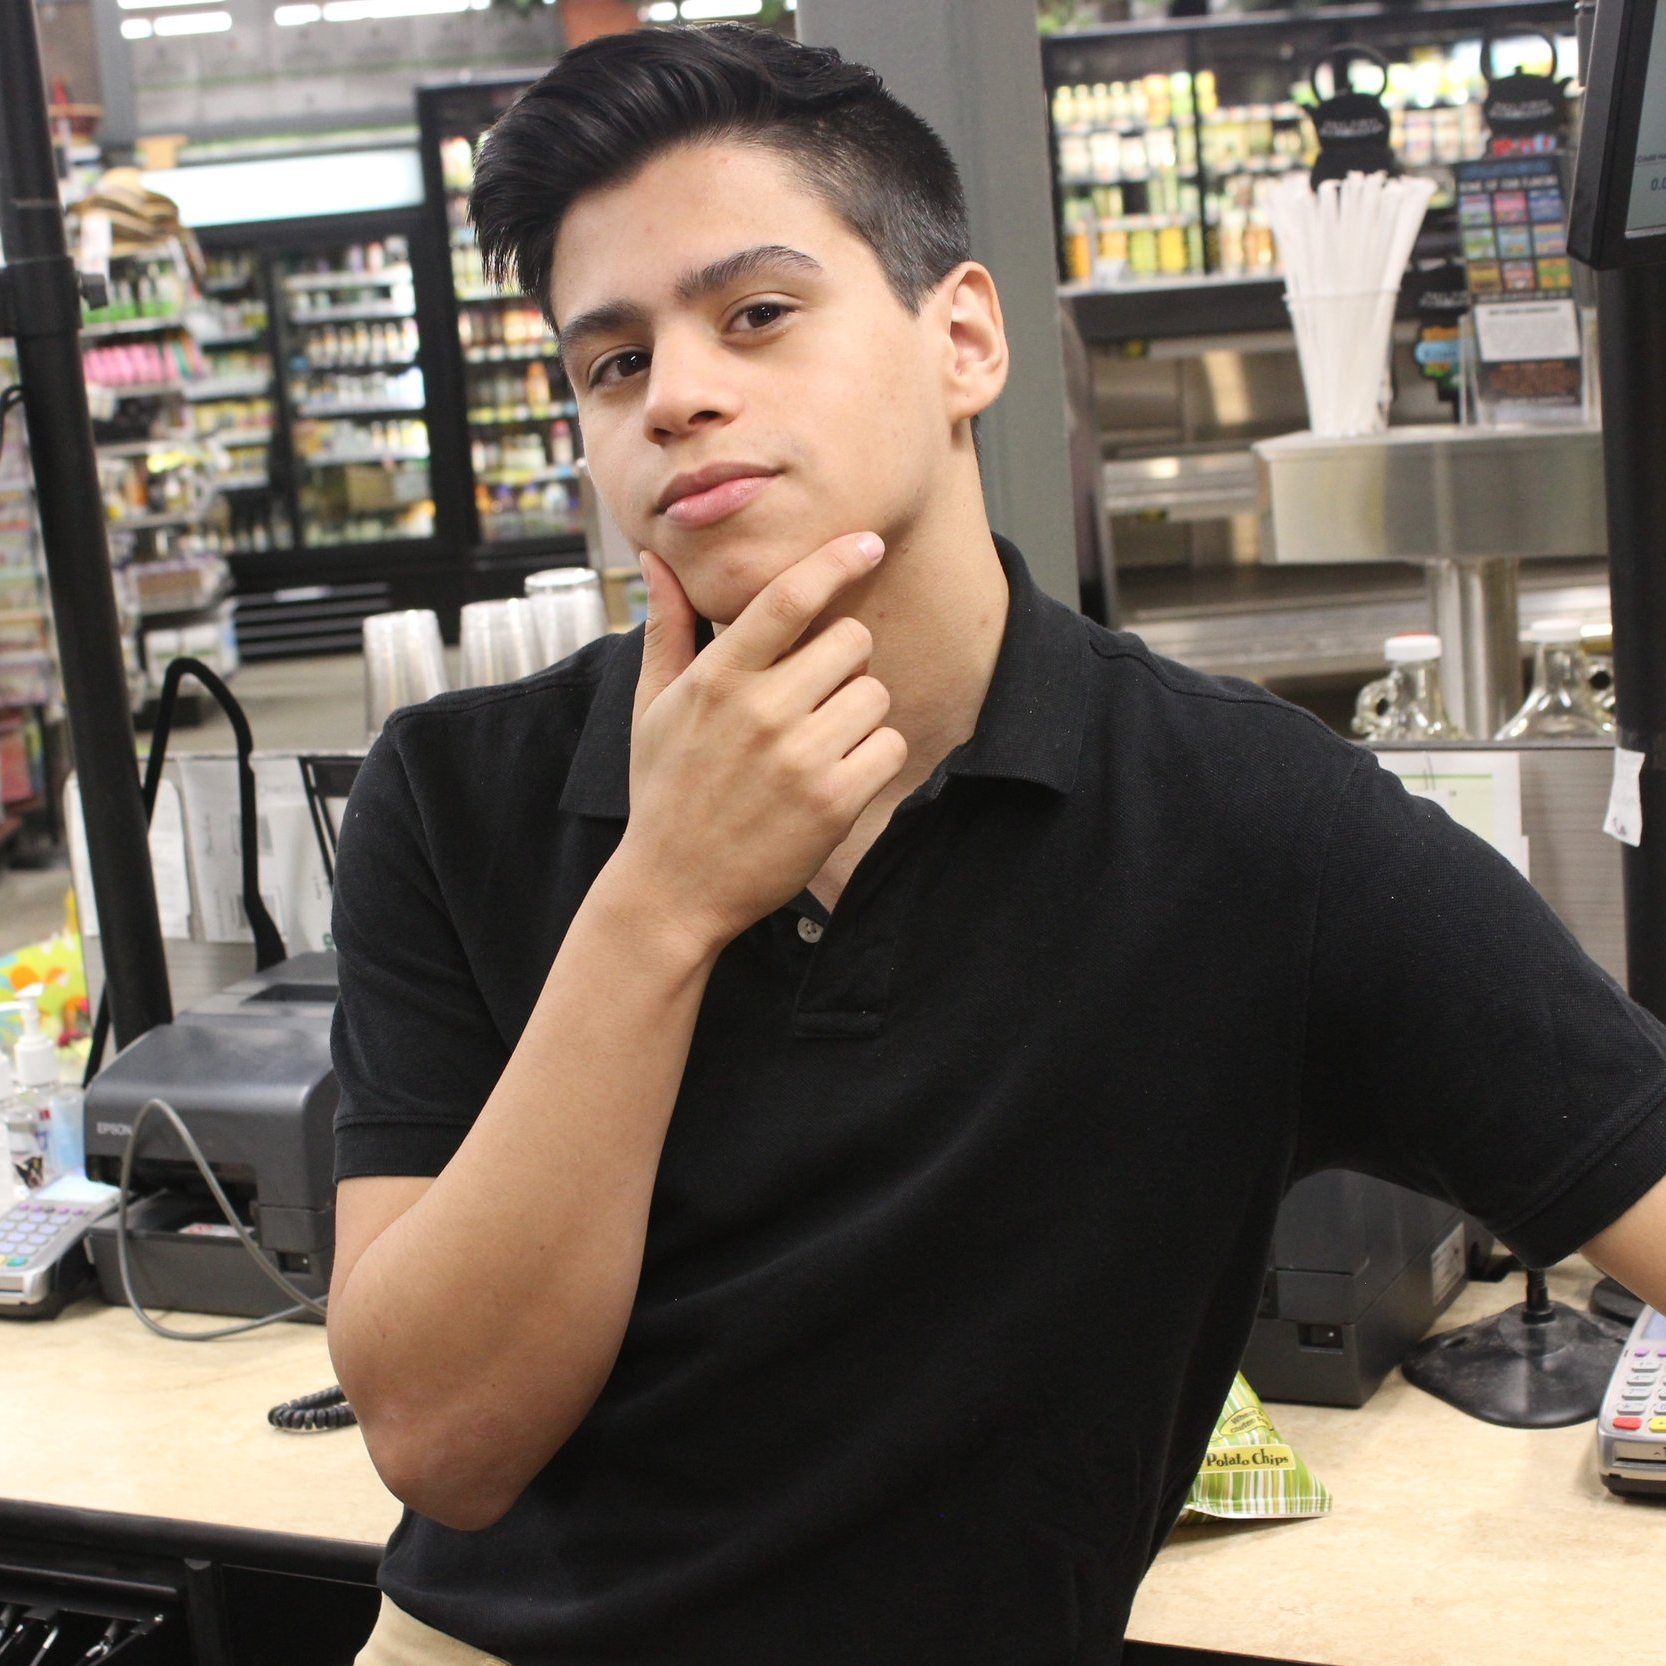 Gabriel Camacho - High schooler by day, aspiring actor by night, germaphobe all the time...